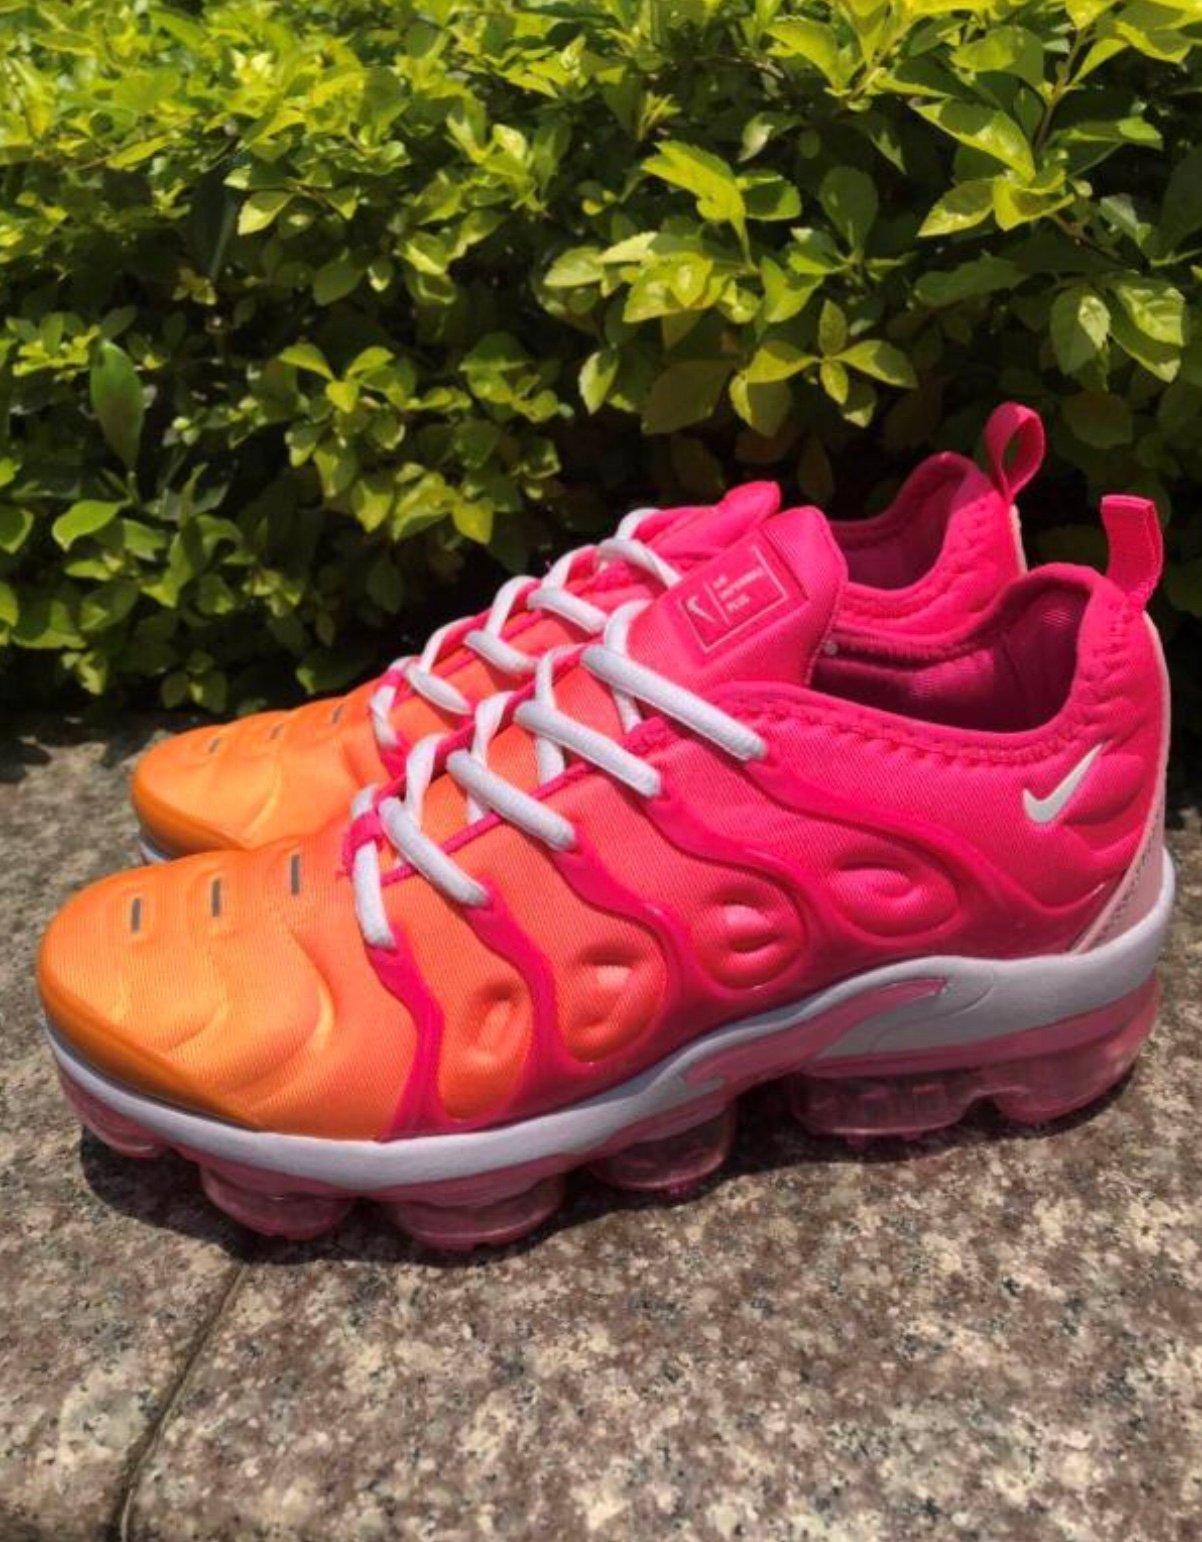 pink and orange vapormax